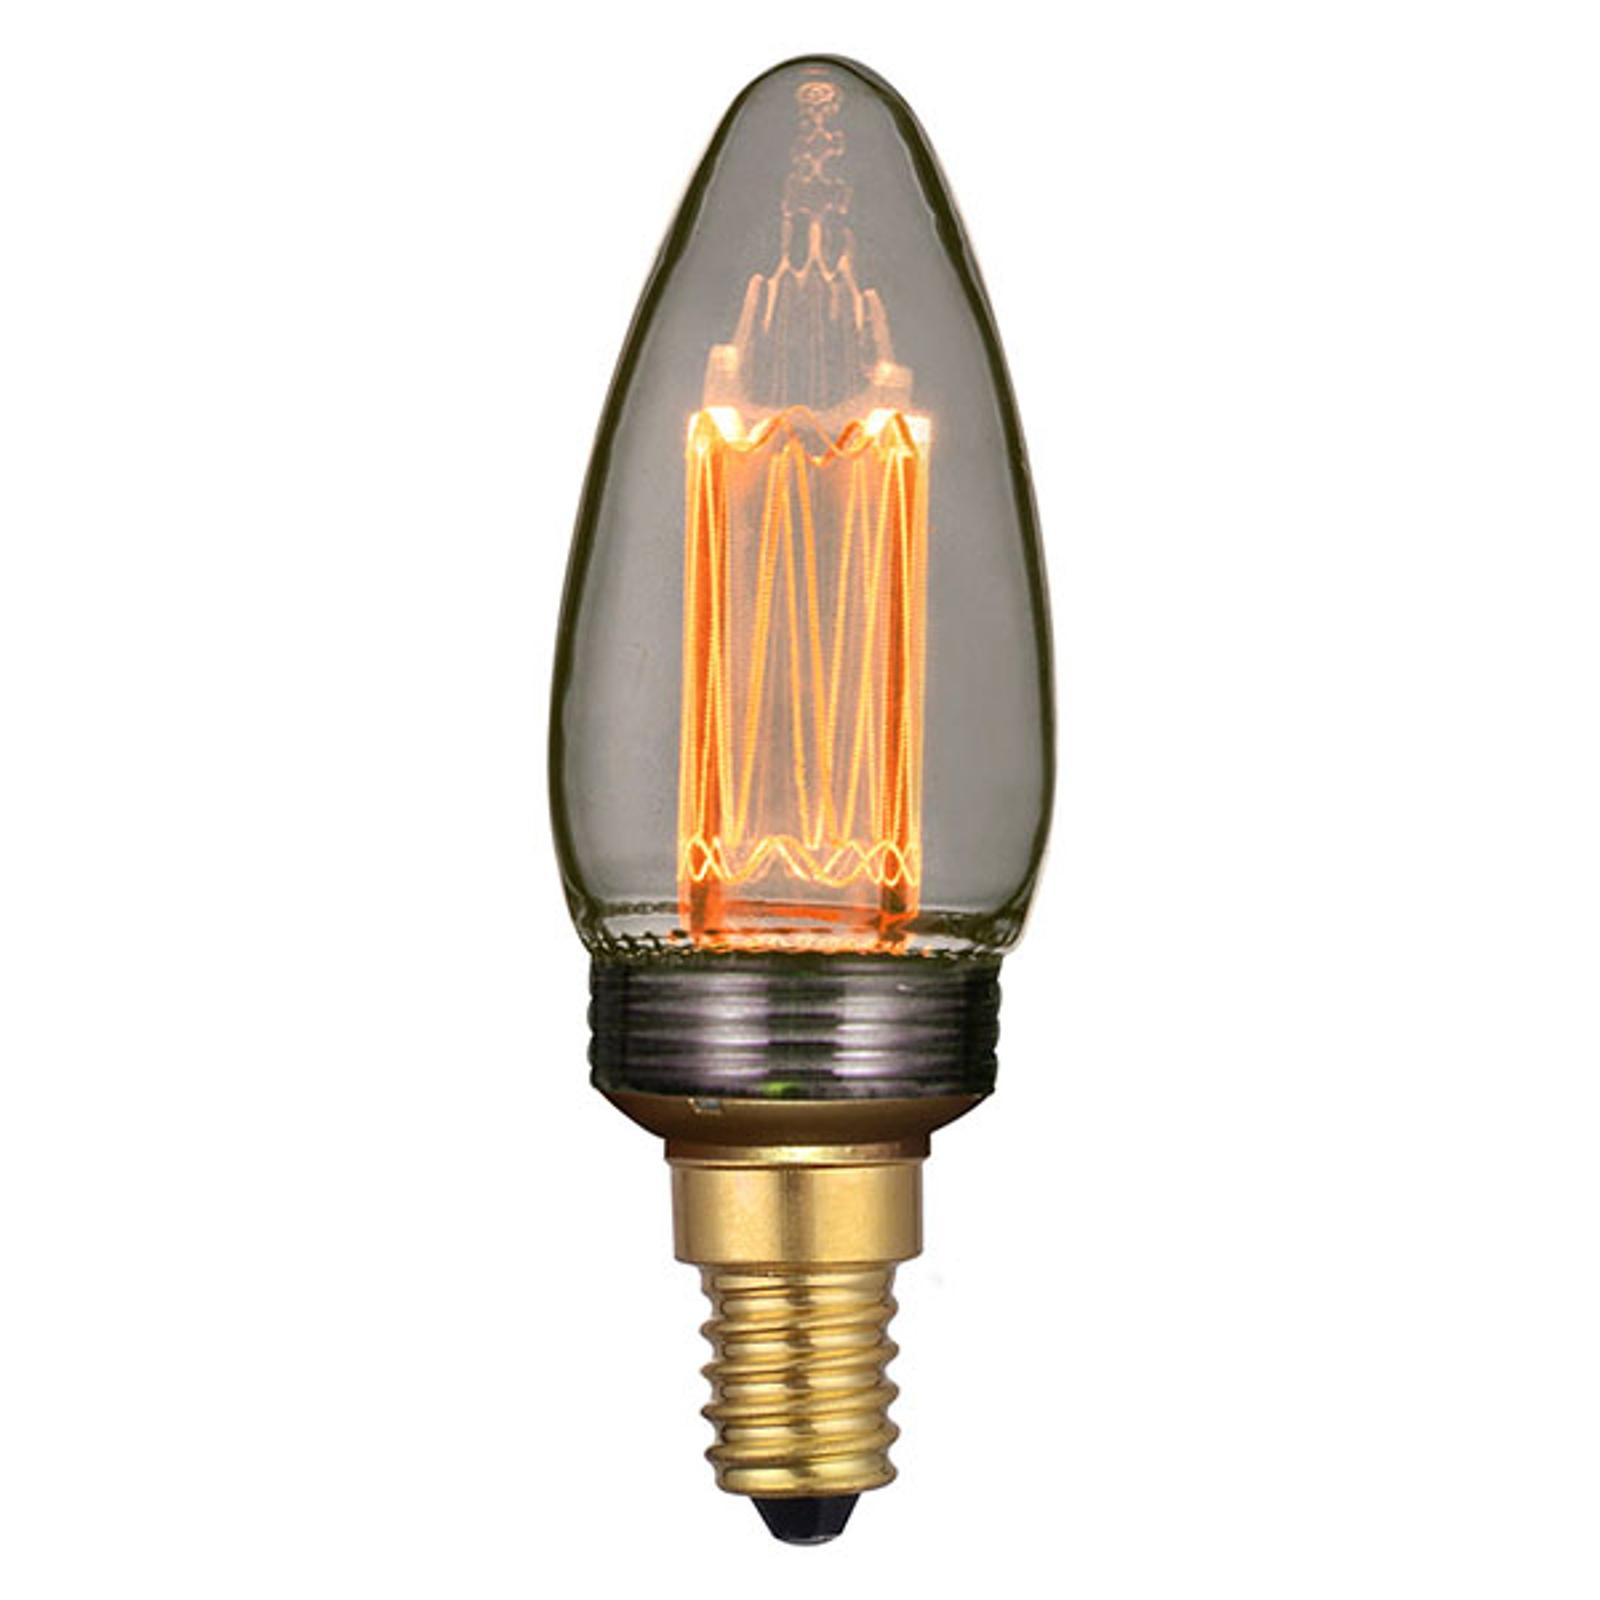 LED-Kerzenlampe E14 2W Filament, dimmbar, smoke